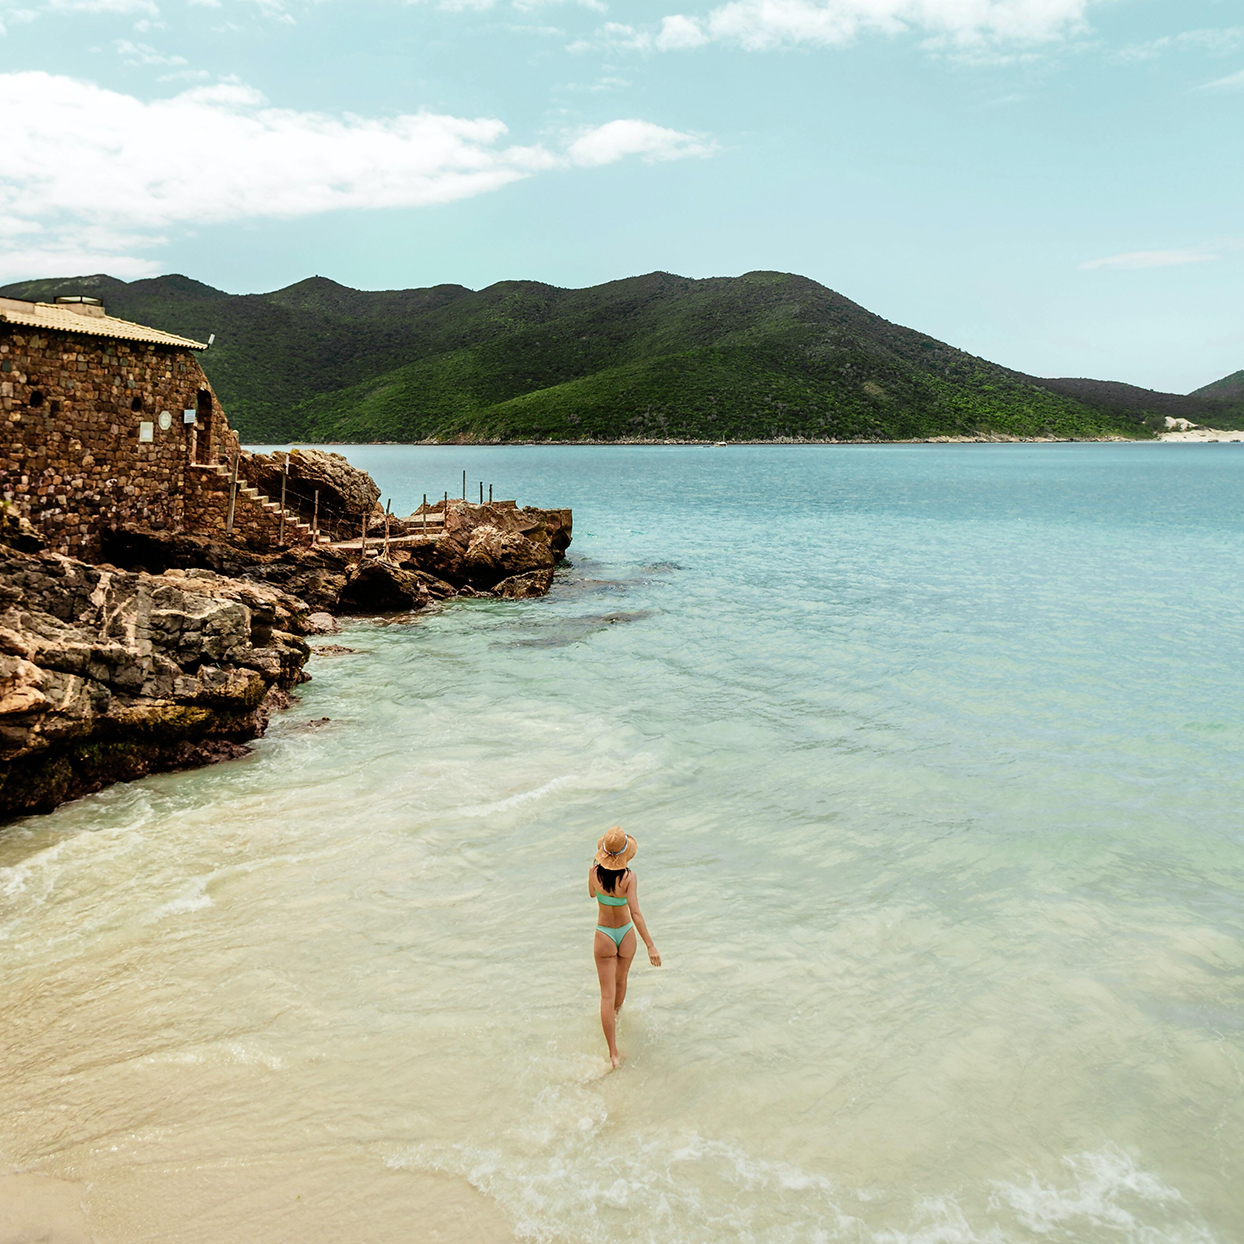 Explore Riviera Maya's Hidden Treasures Sweepstakes